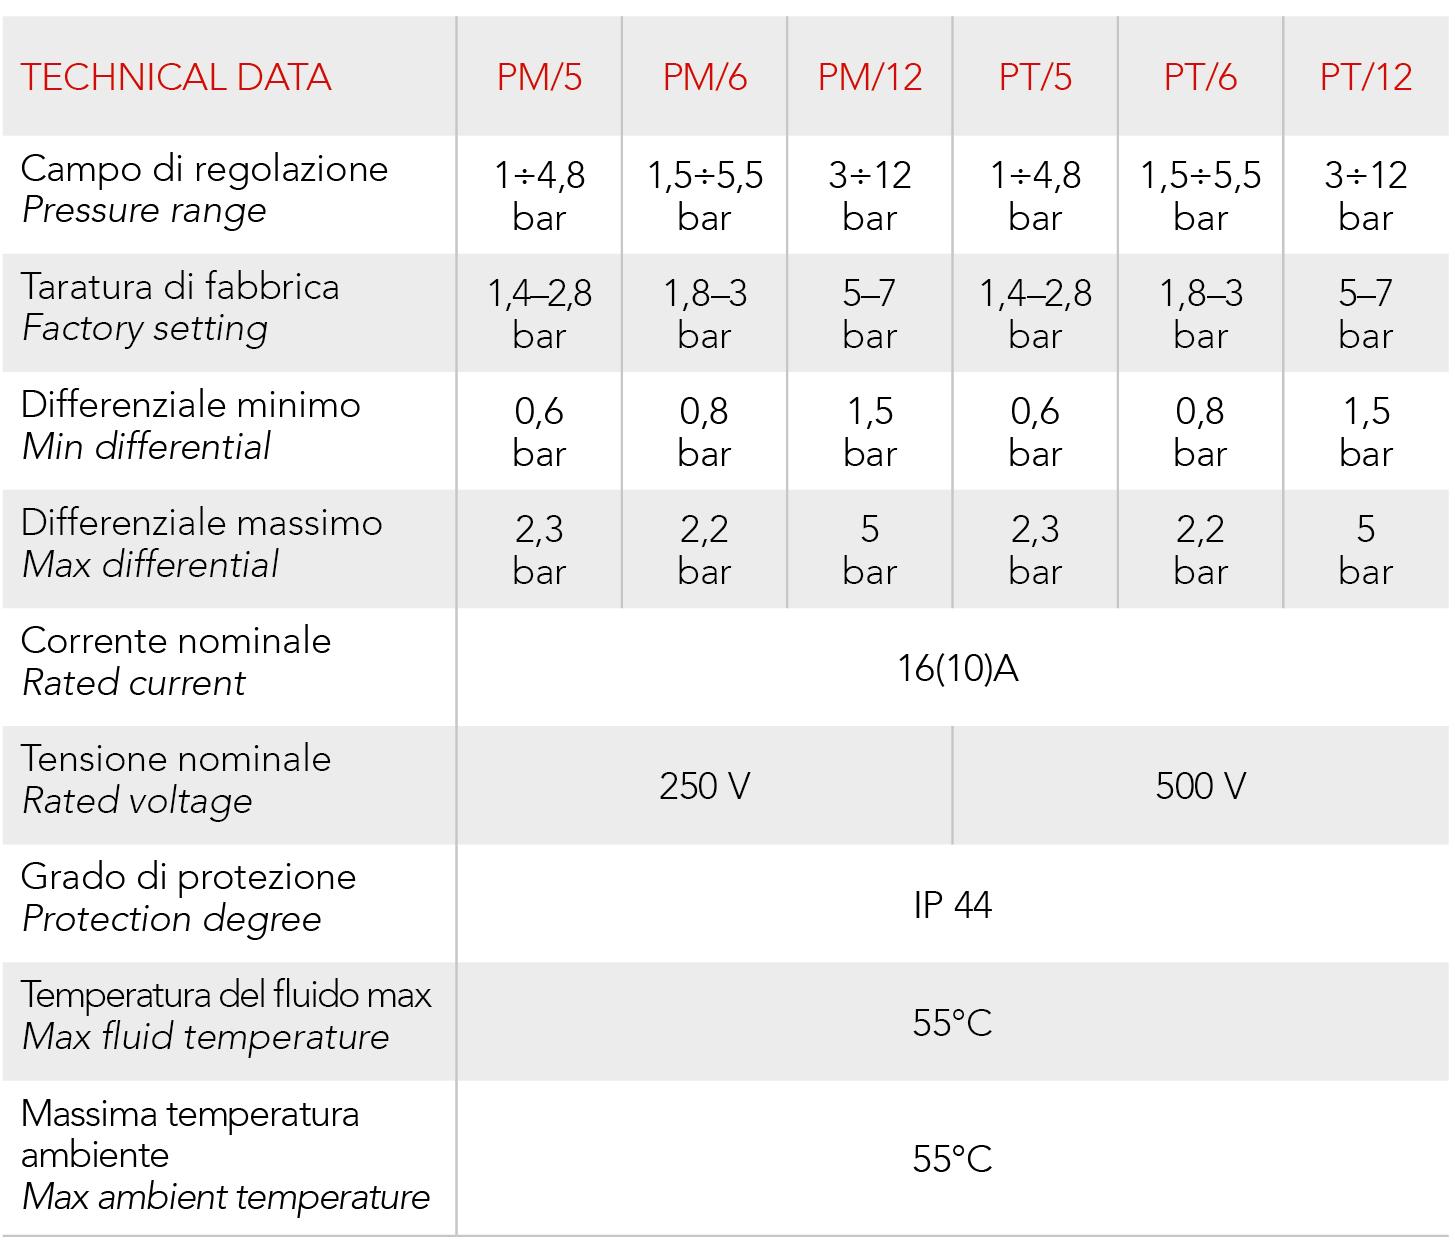 PM 5 PM12 ITAL TECHINC